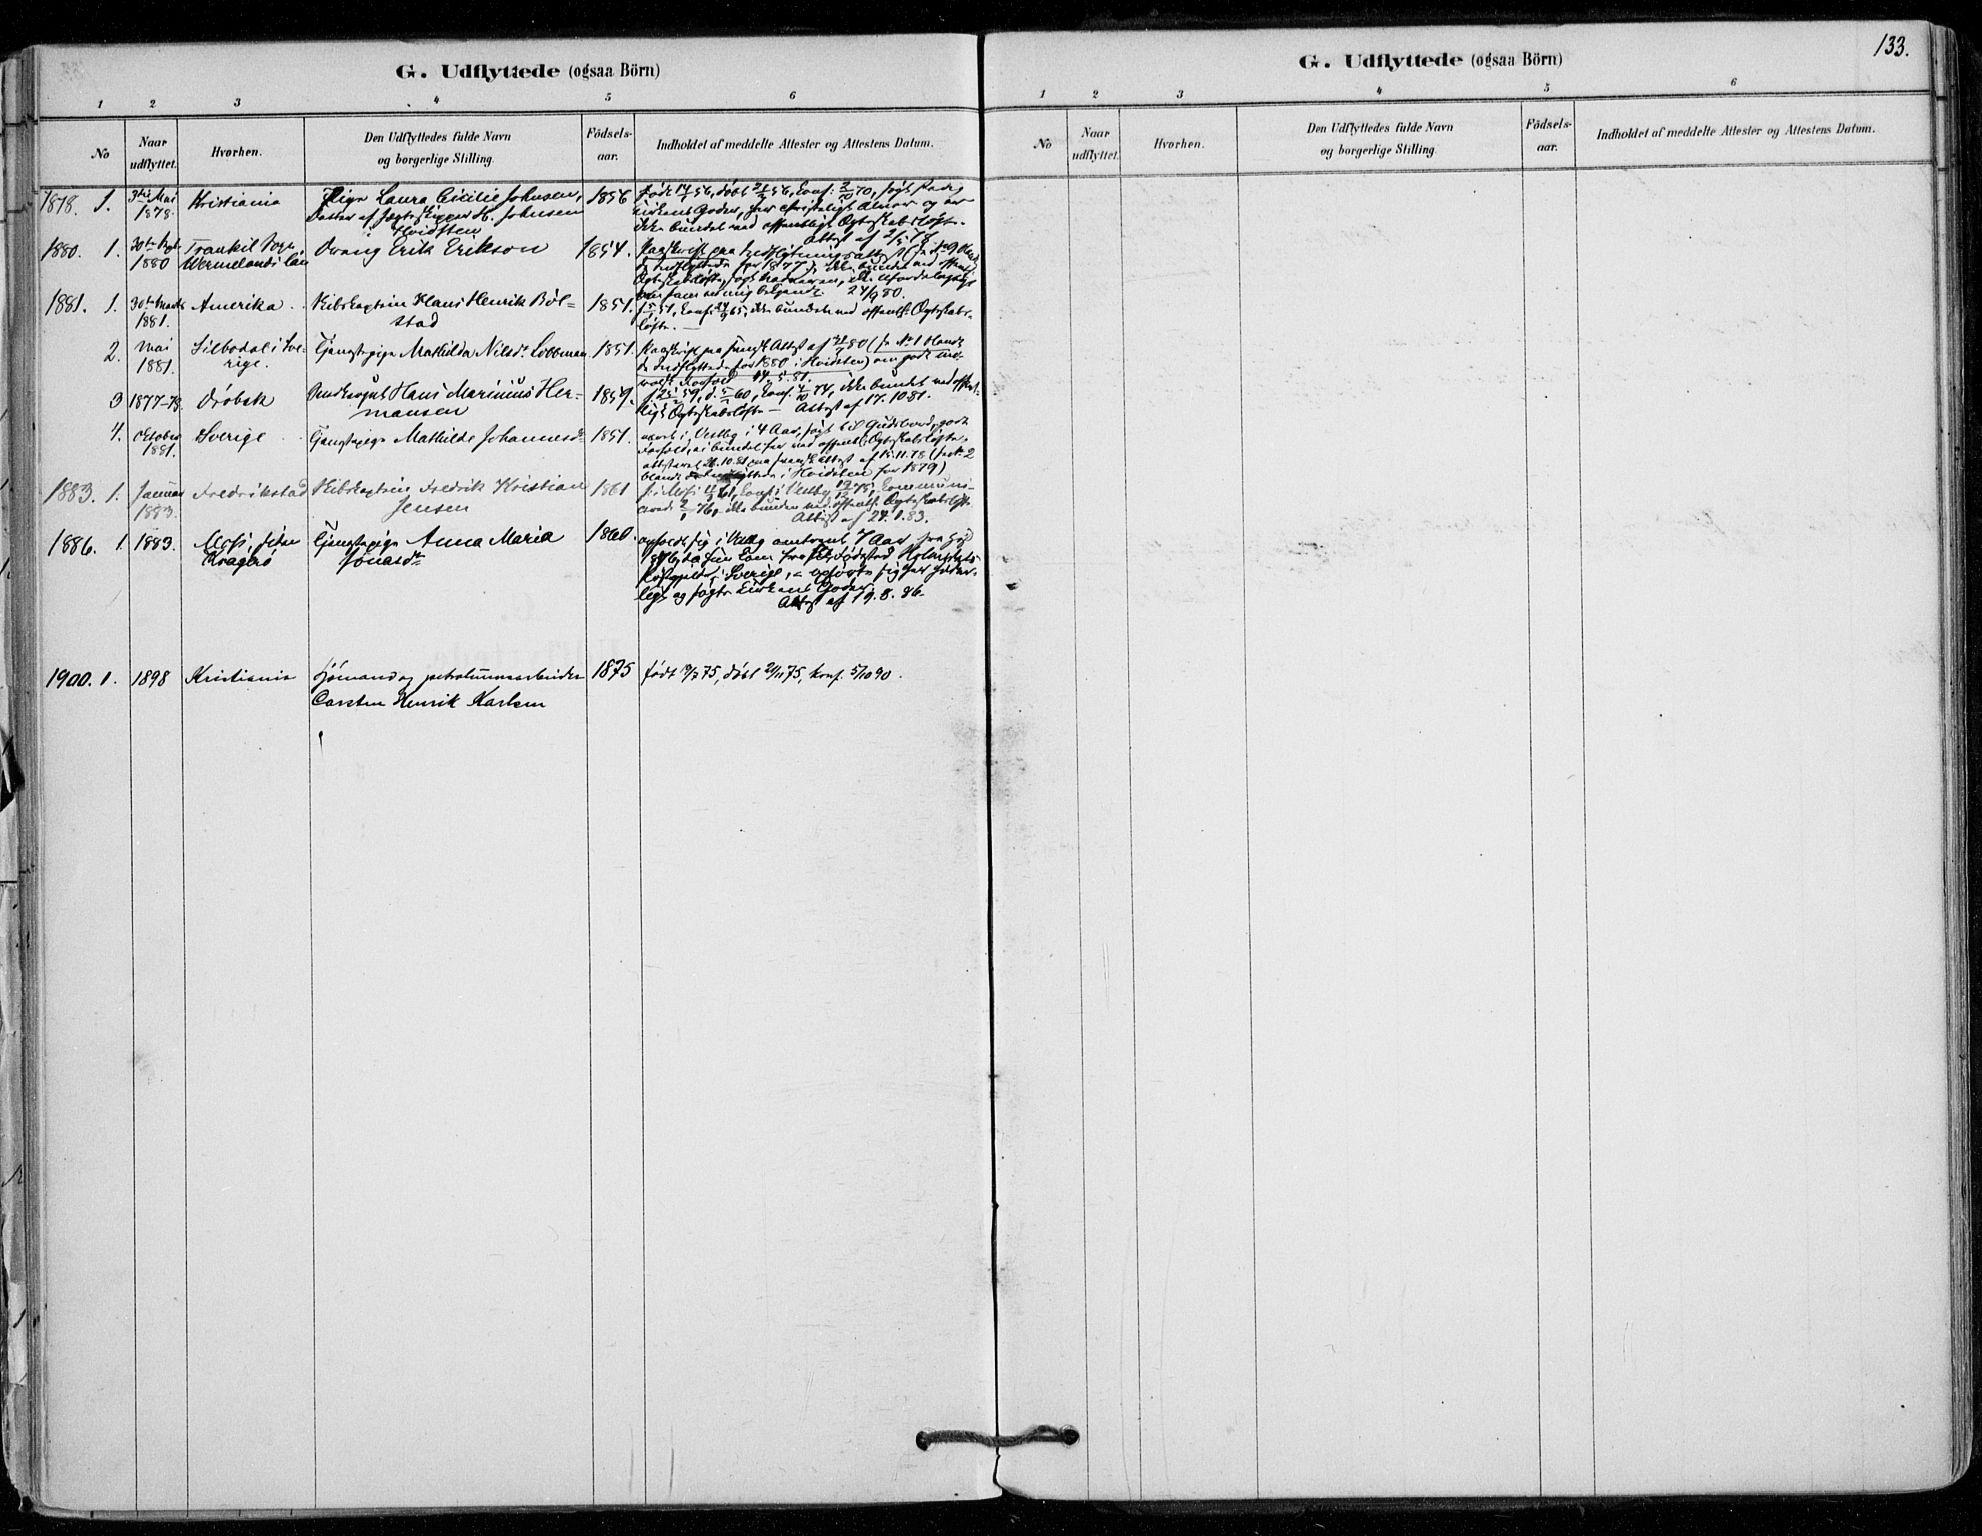 SAO, Vestby prestekontor Kirkebøker, F/Fd/L0001: Ministerialbok nr. IV 1, 1878-1945, s. 133